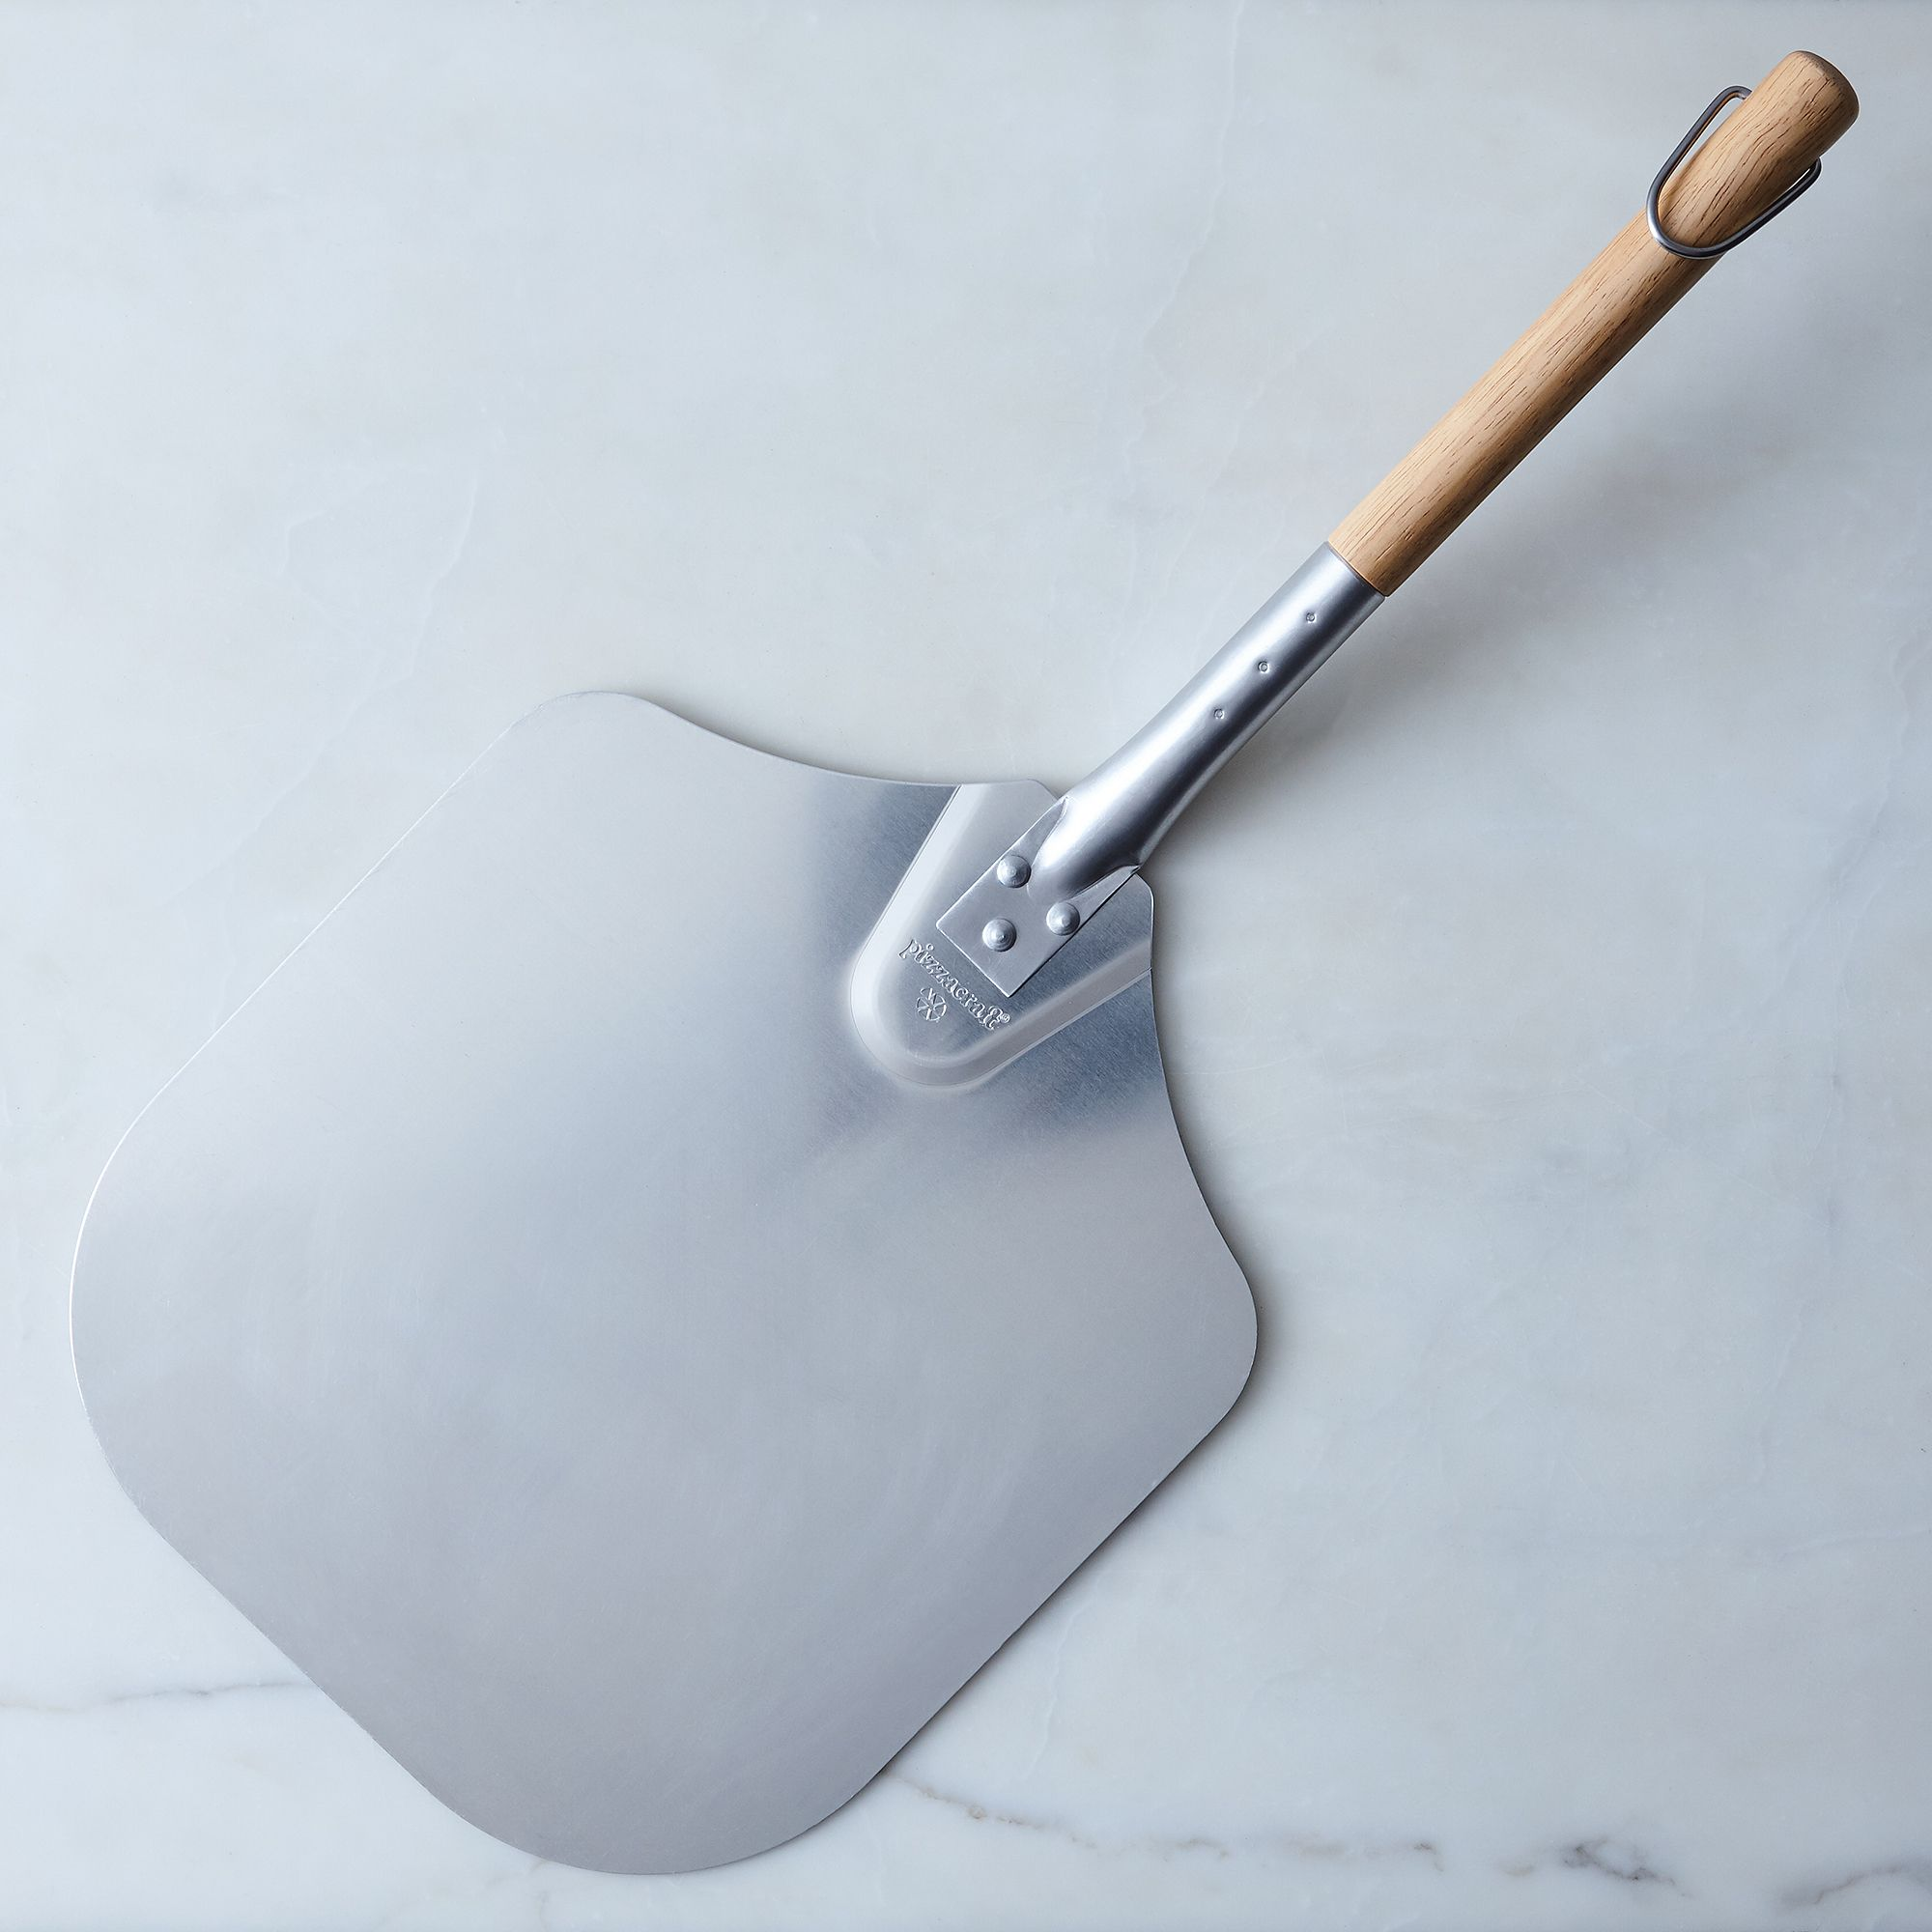 The Kitchen Tools Box